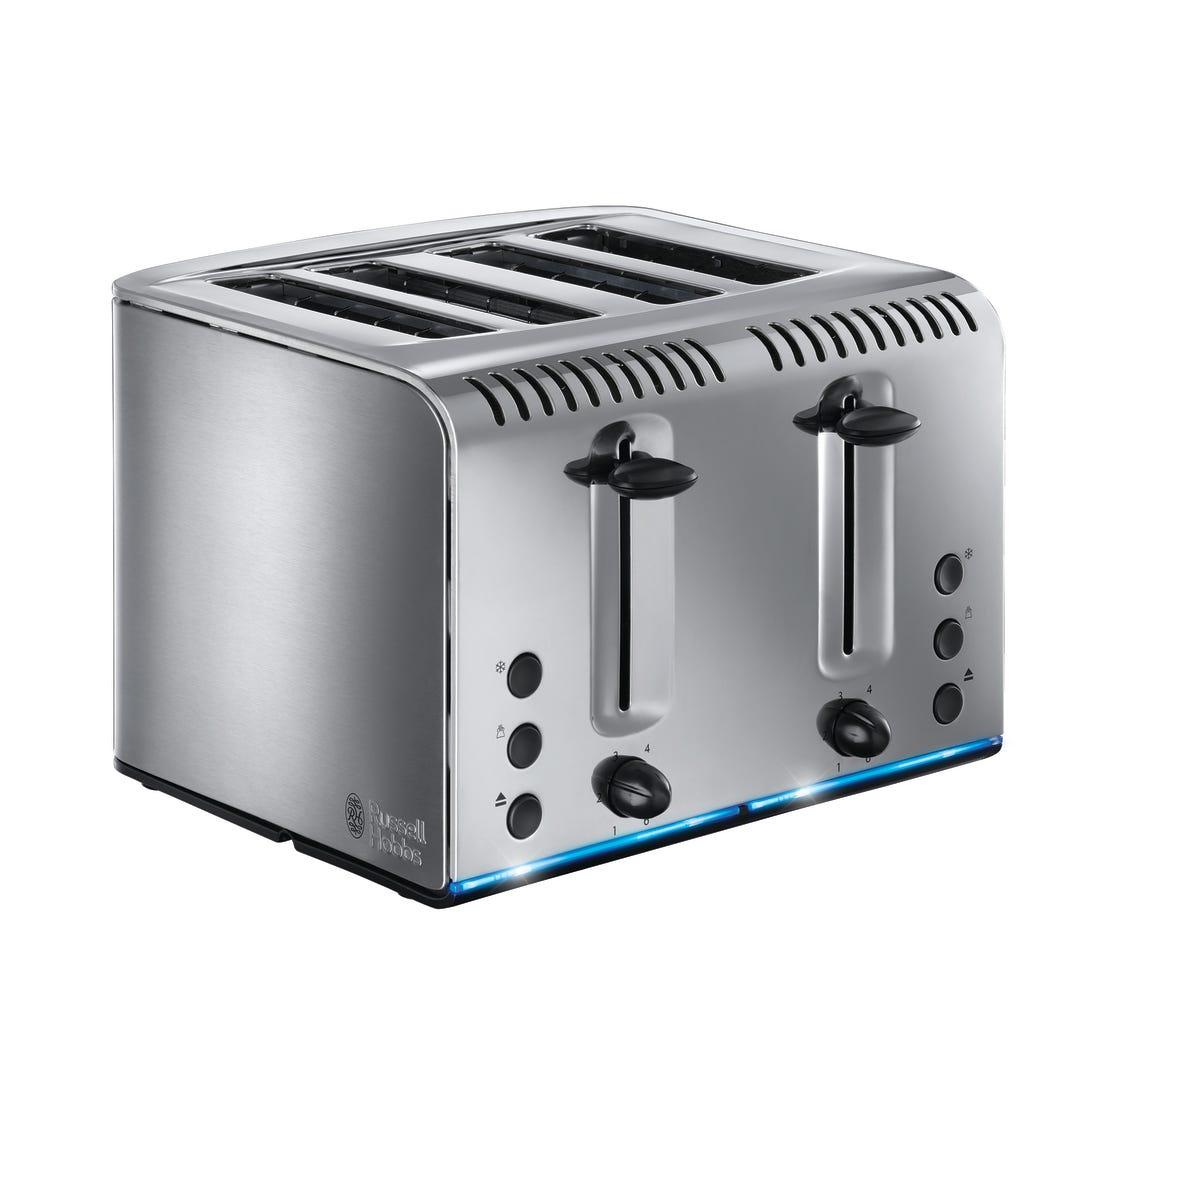 Russell Hobbs 20750 Buckingham 4 Slice Toaster - Silver